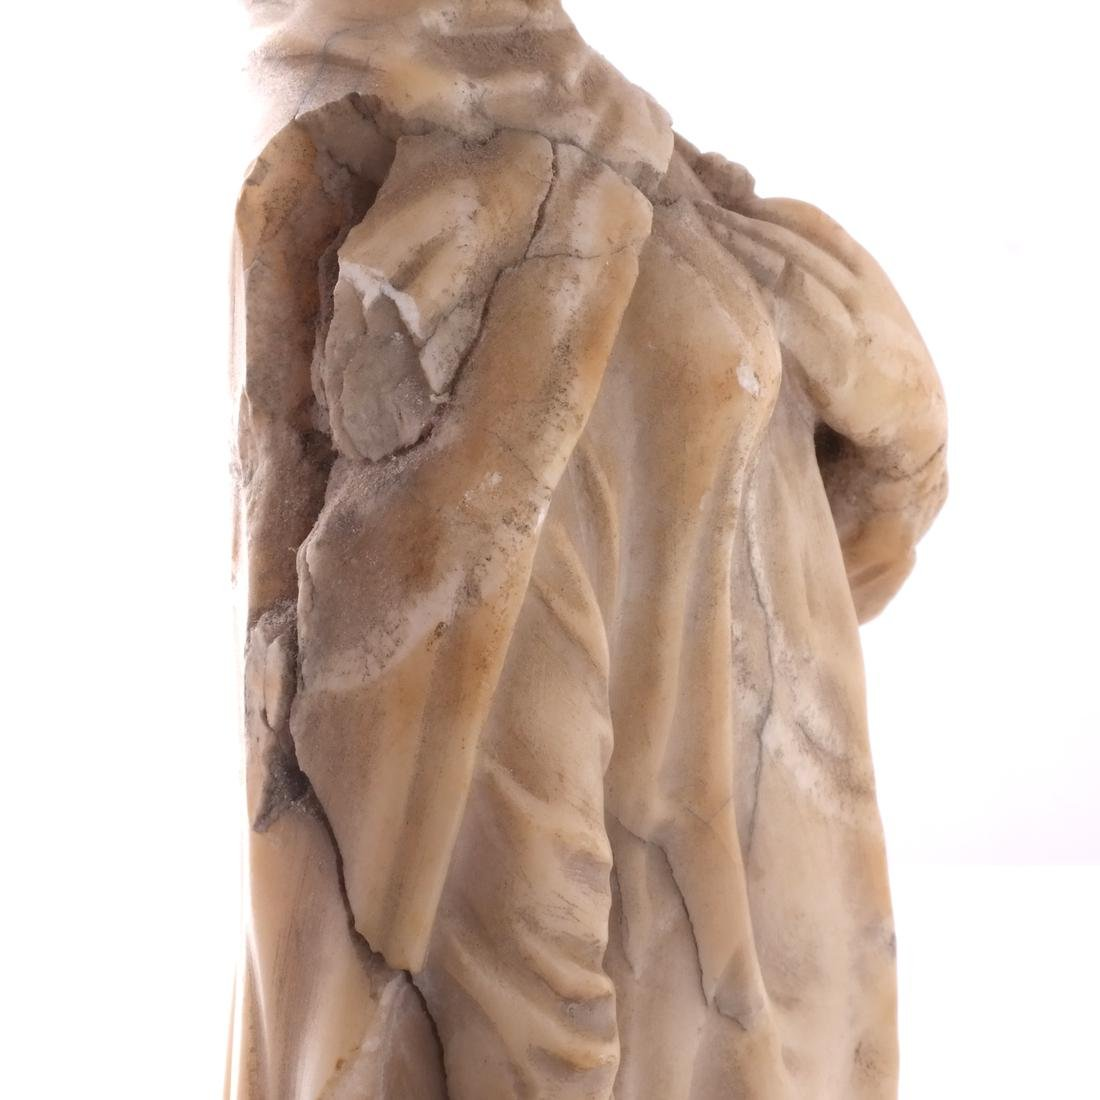 Italian Marble Figure of Beatrice - 3